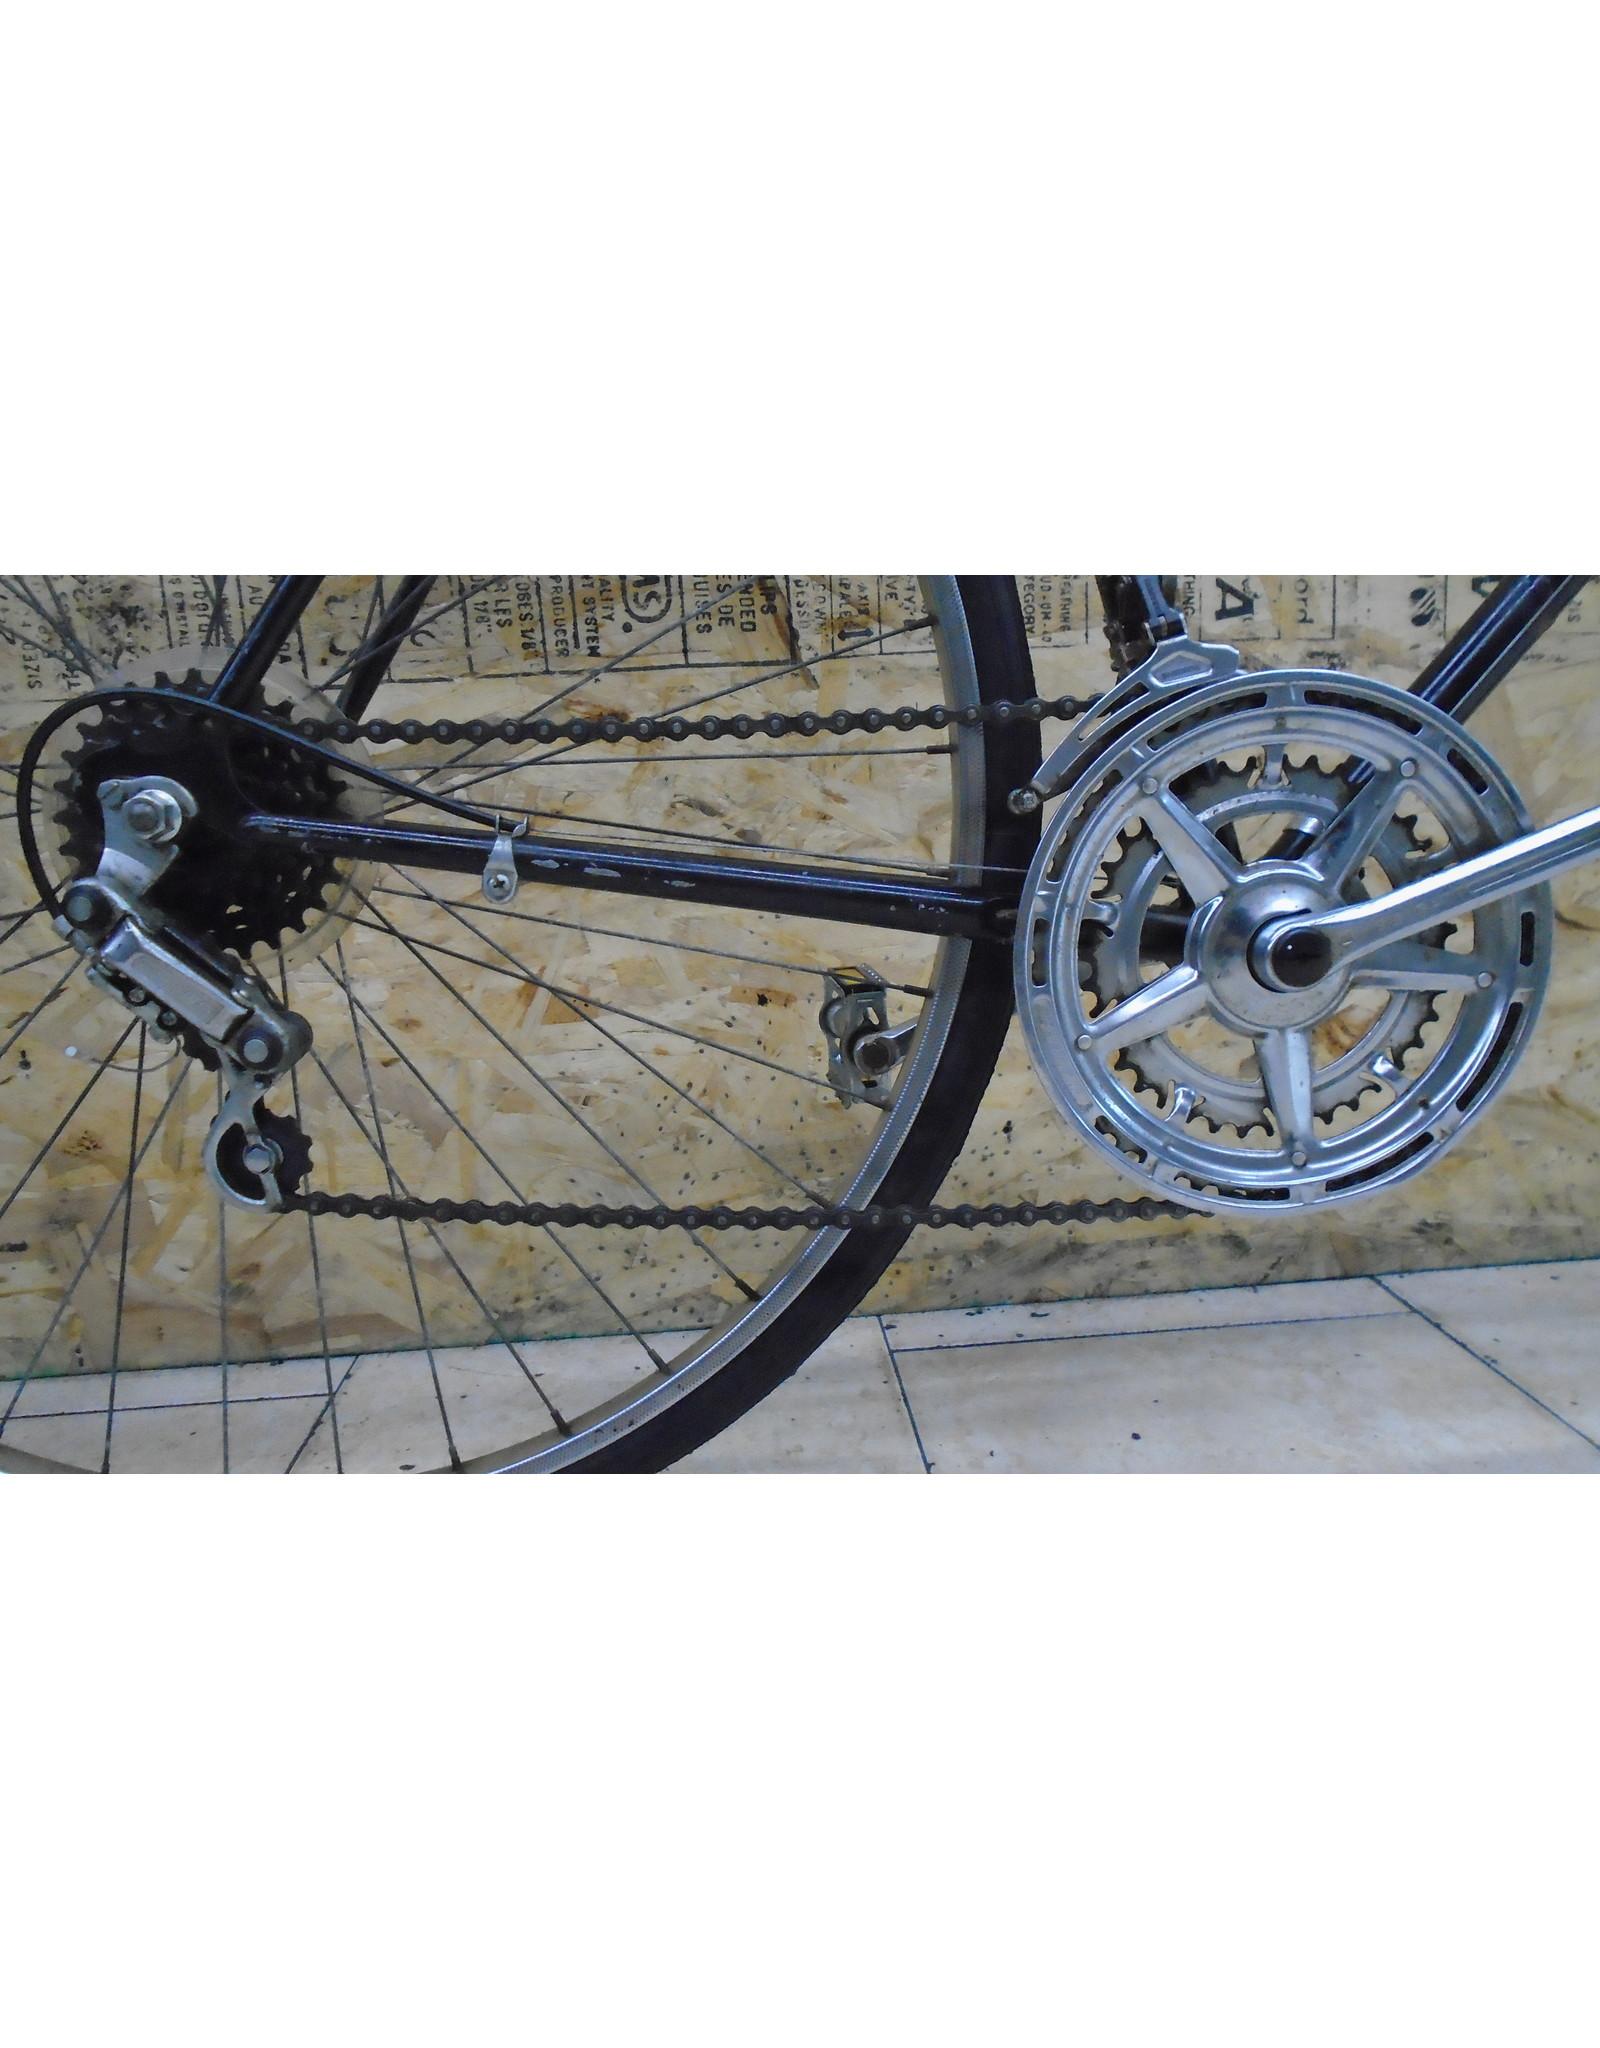 "Vélo usagé de route Grand Prix 21"" - 10223"